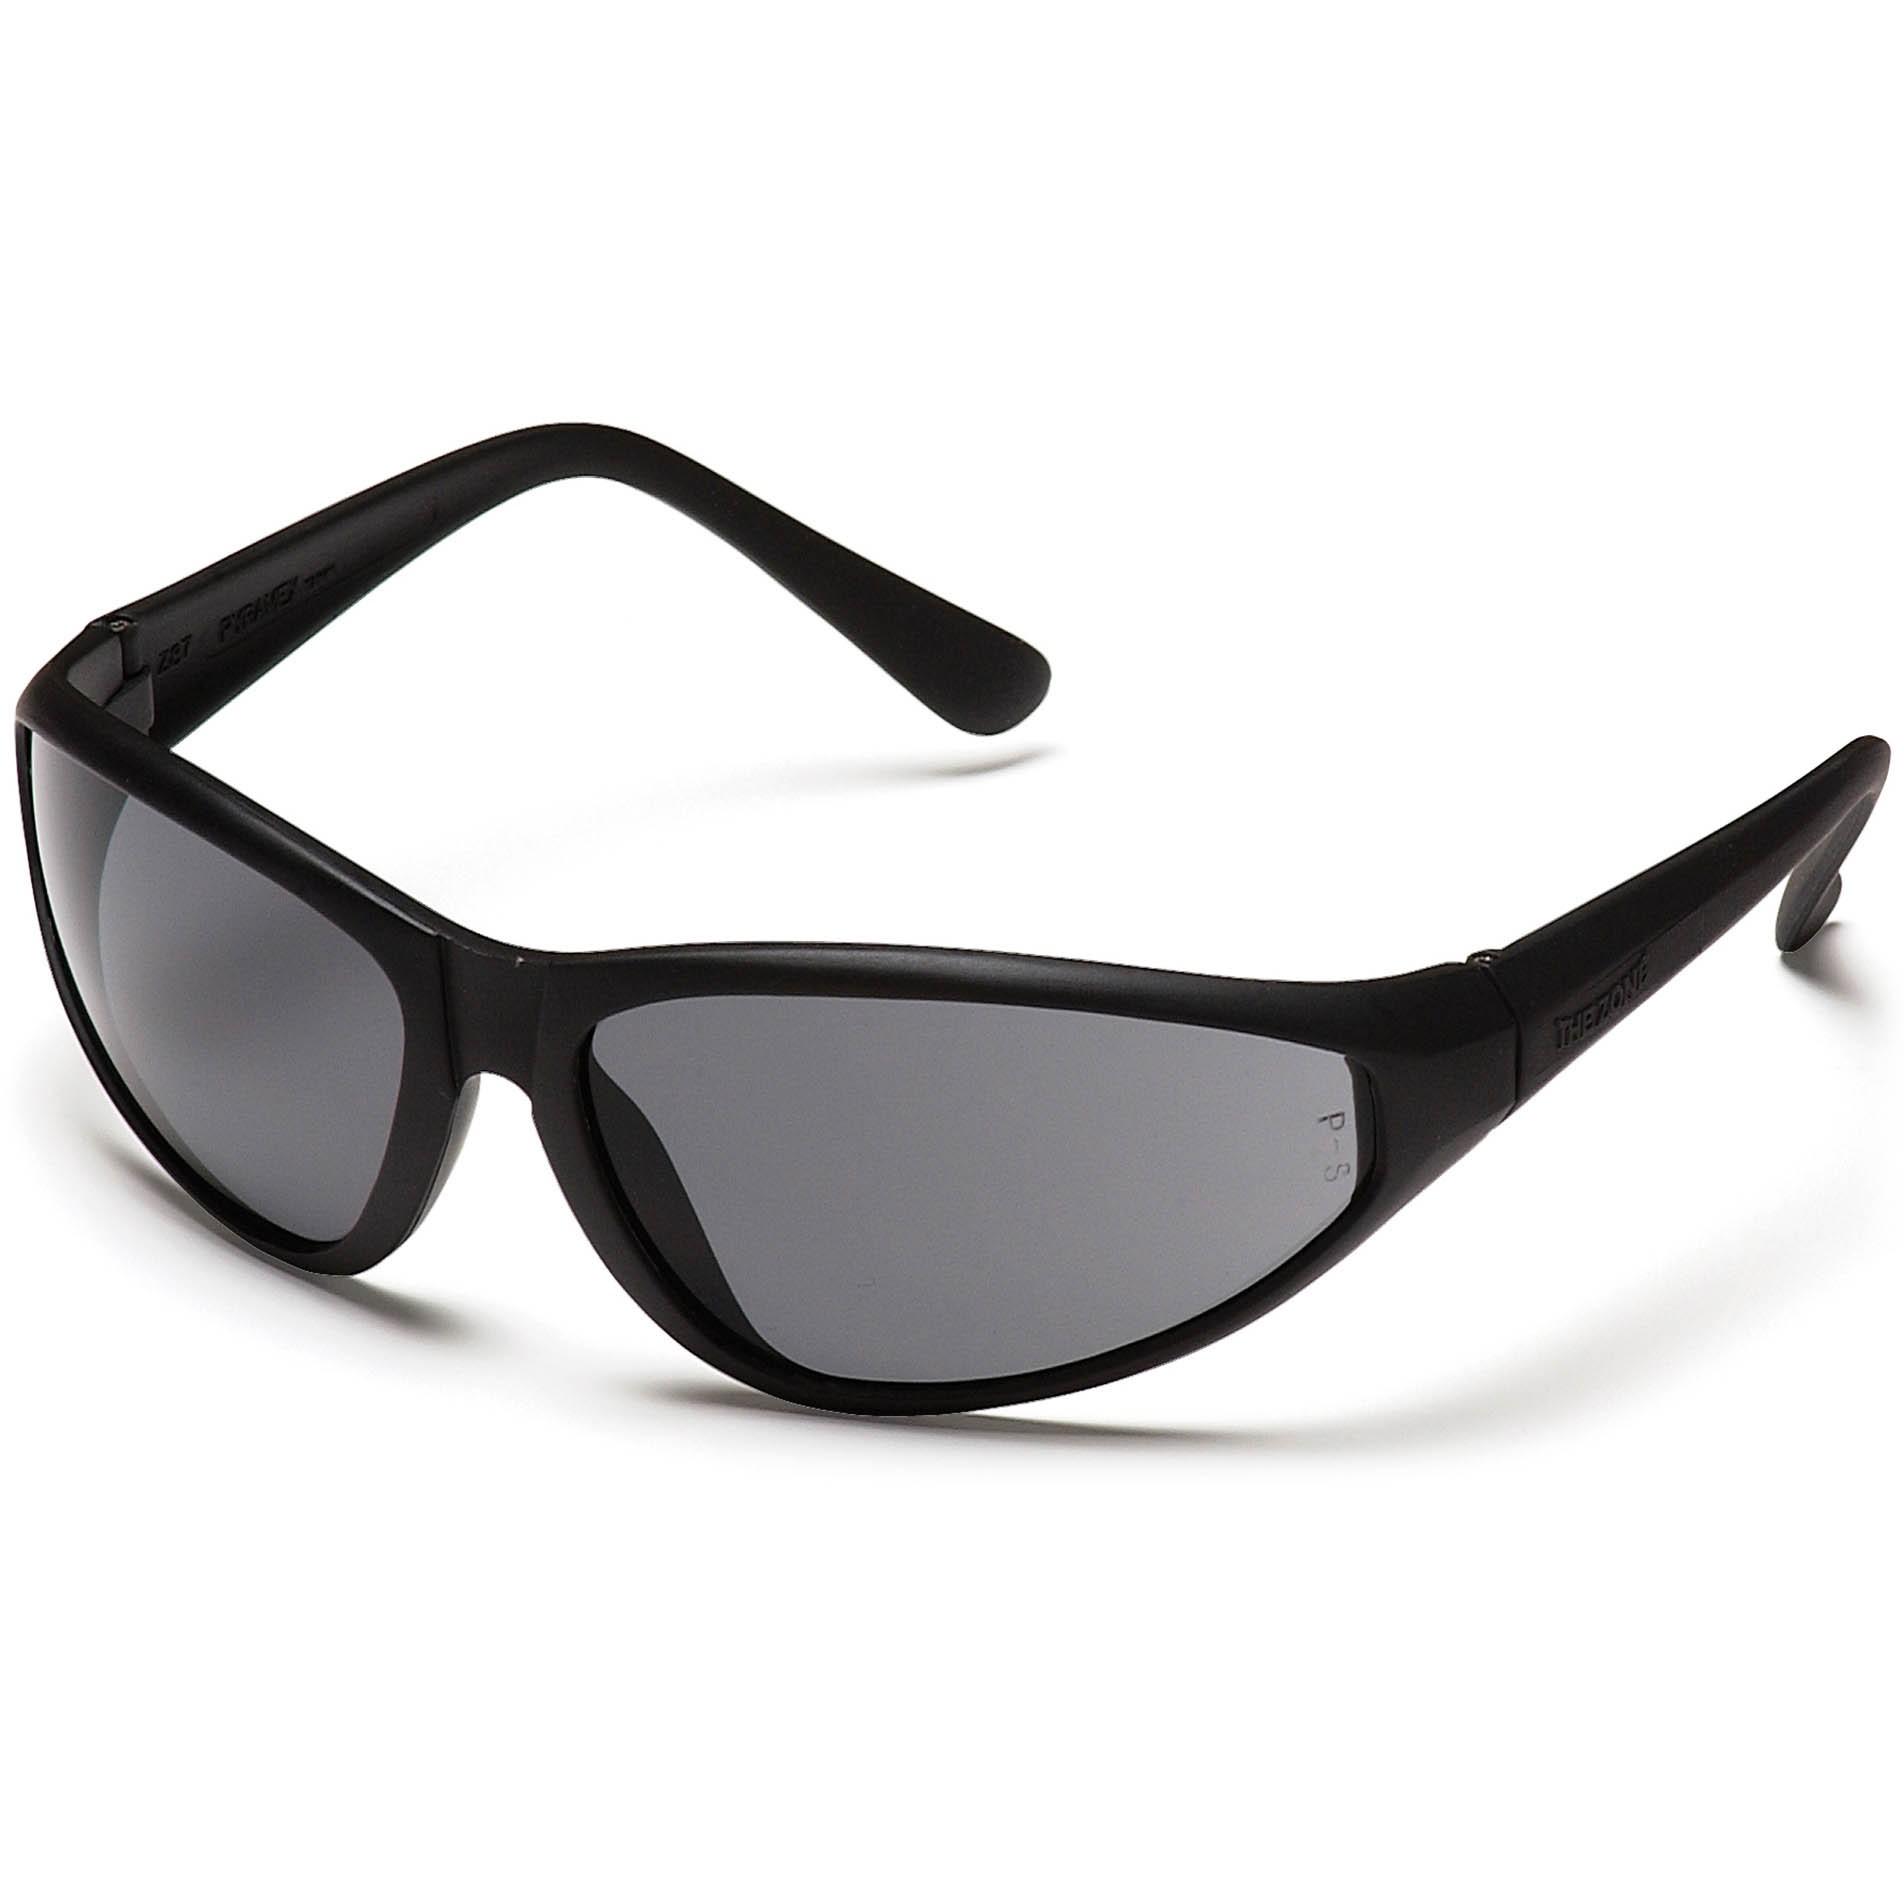 Glasses Gray Frame : Pyramex Zone Safety Glasses - Black Frame - Gray Lens ...